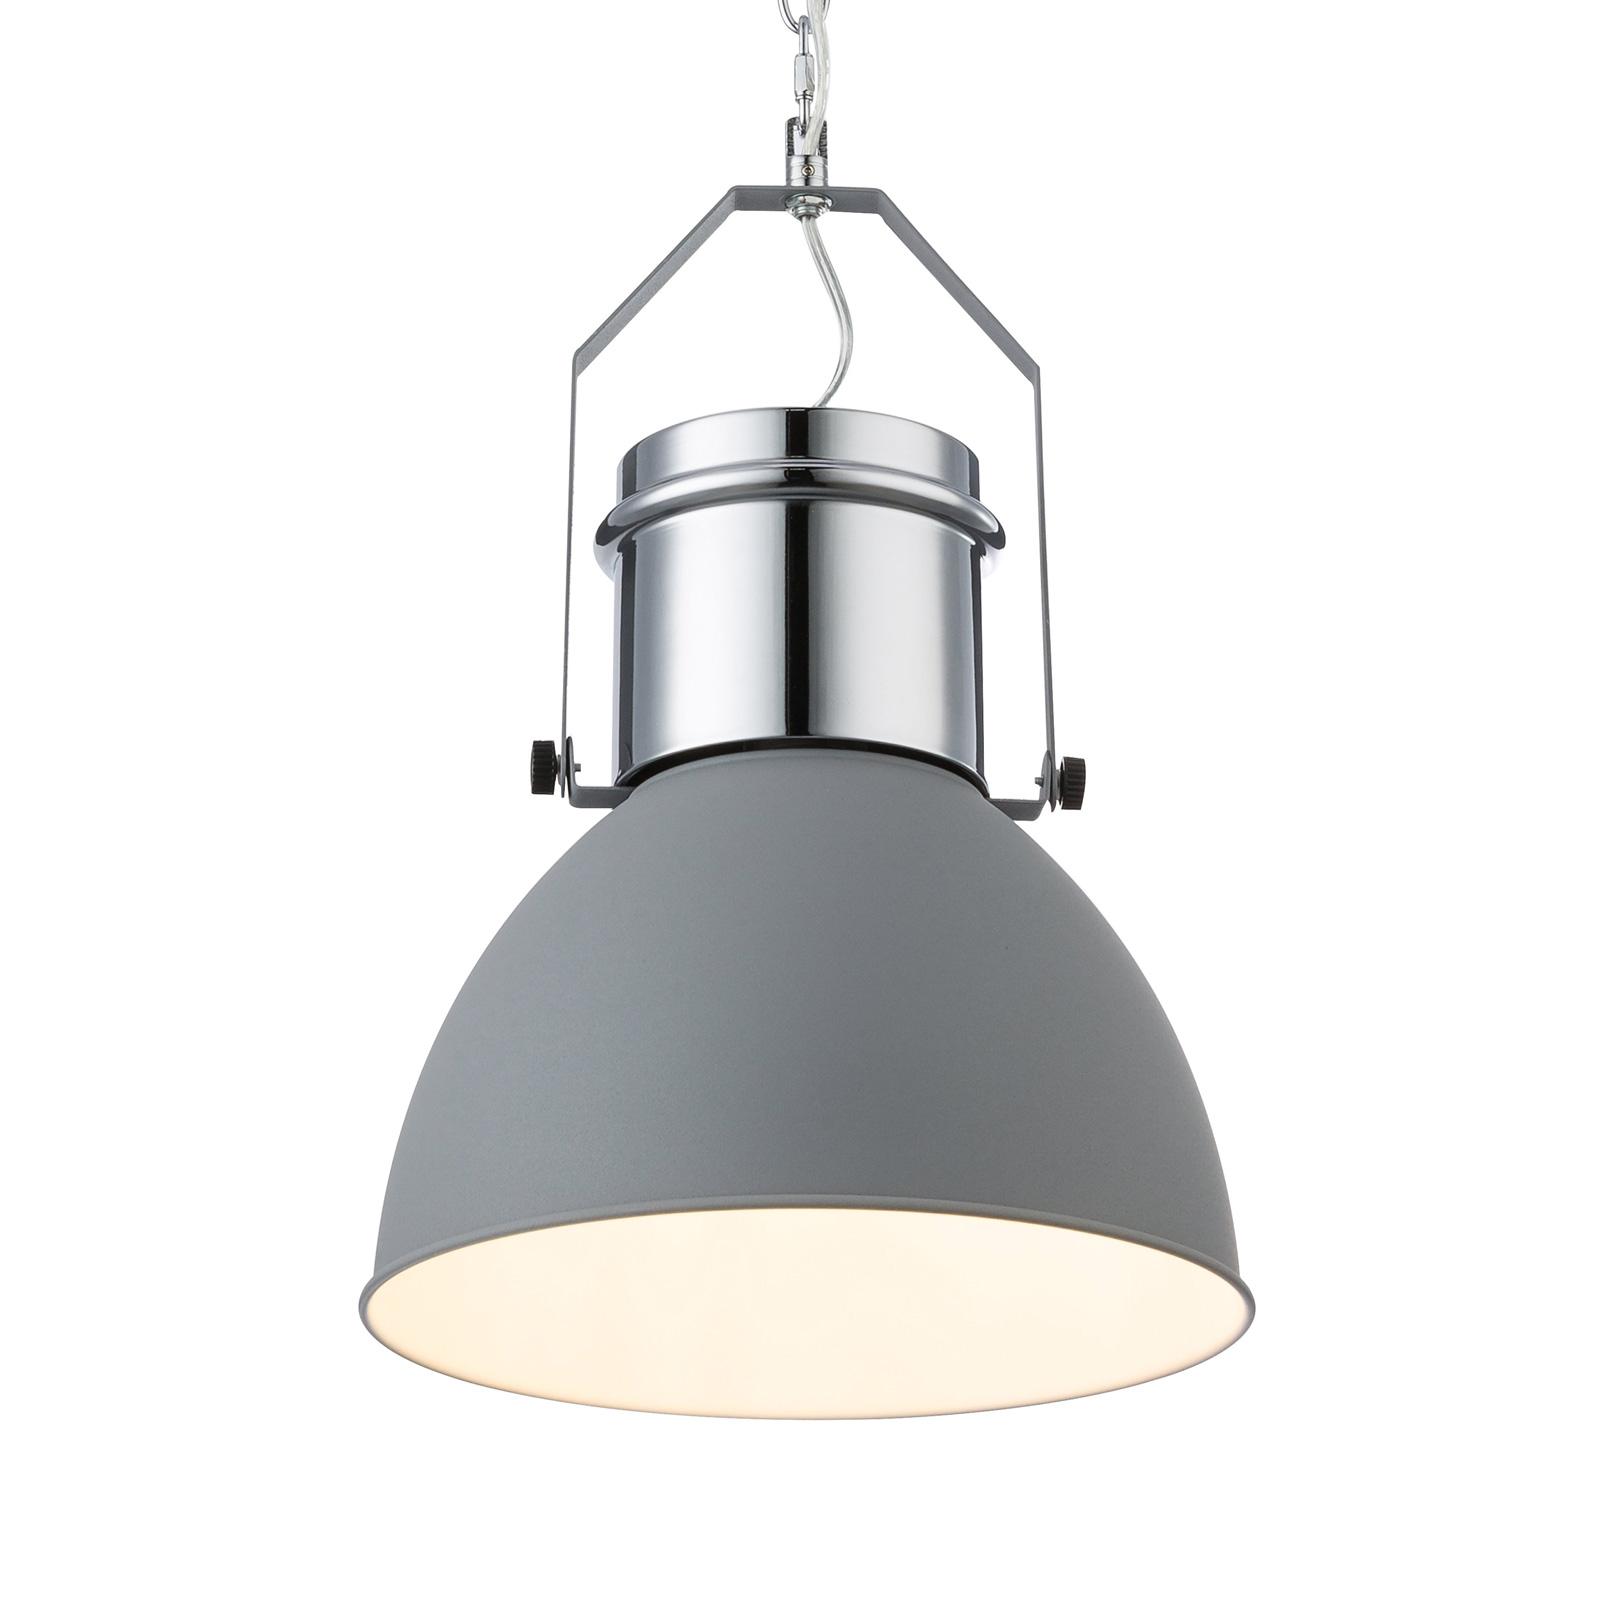 Hanglamp Kutum, grijs, chroom